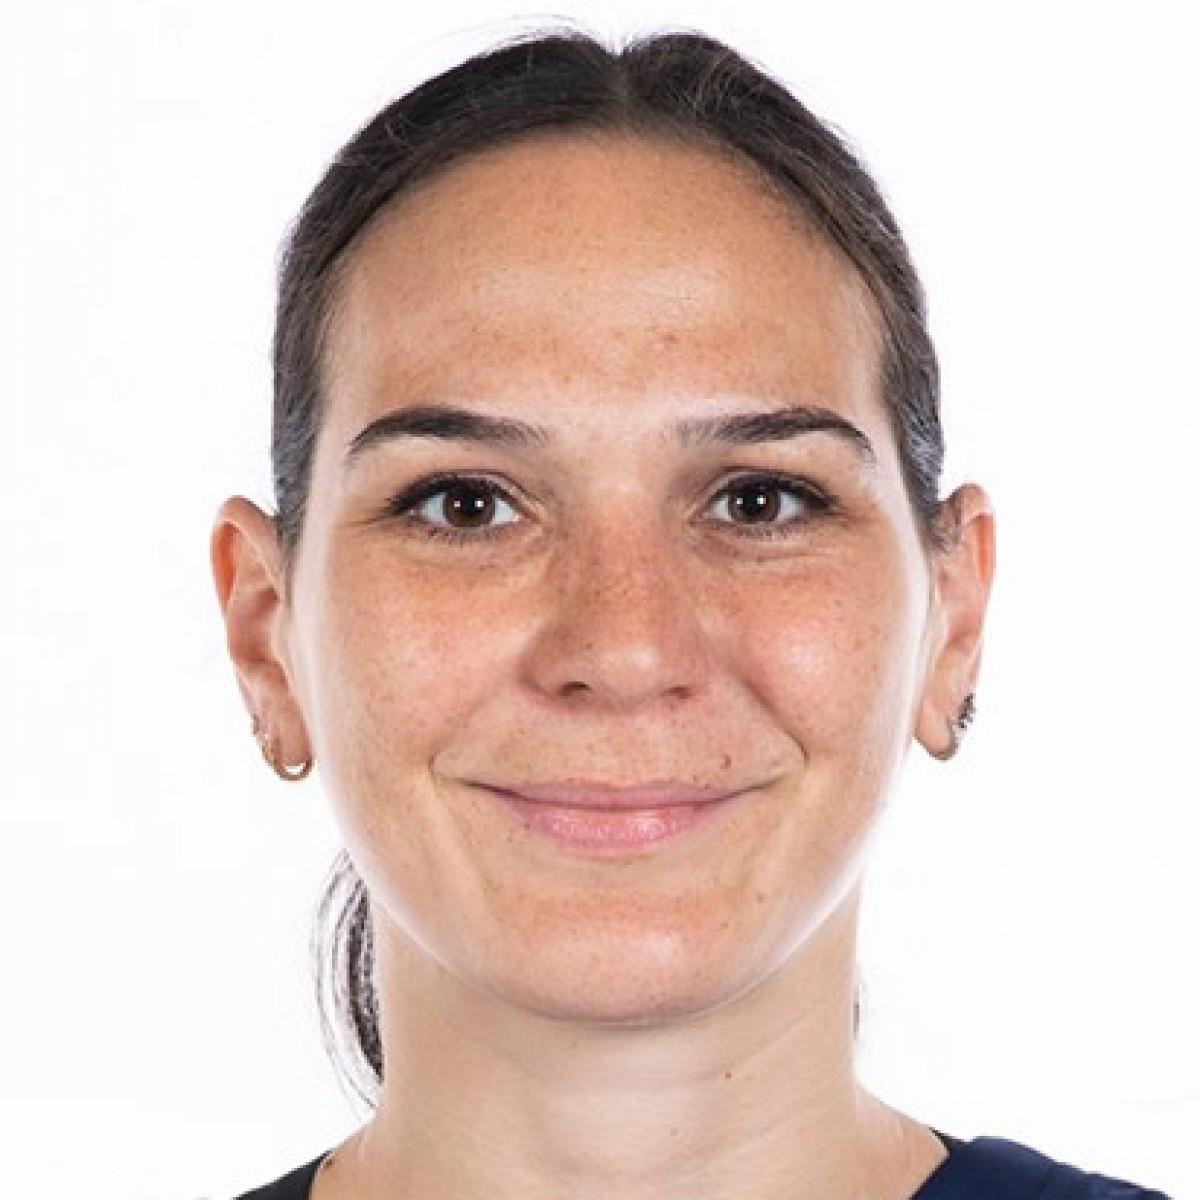 Sonja Vasic